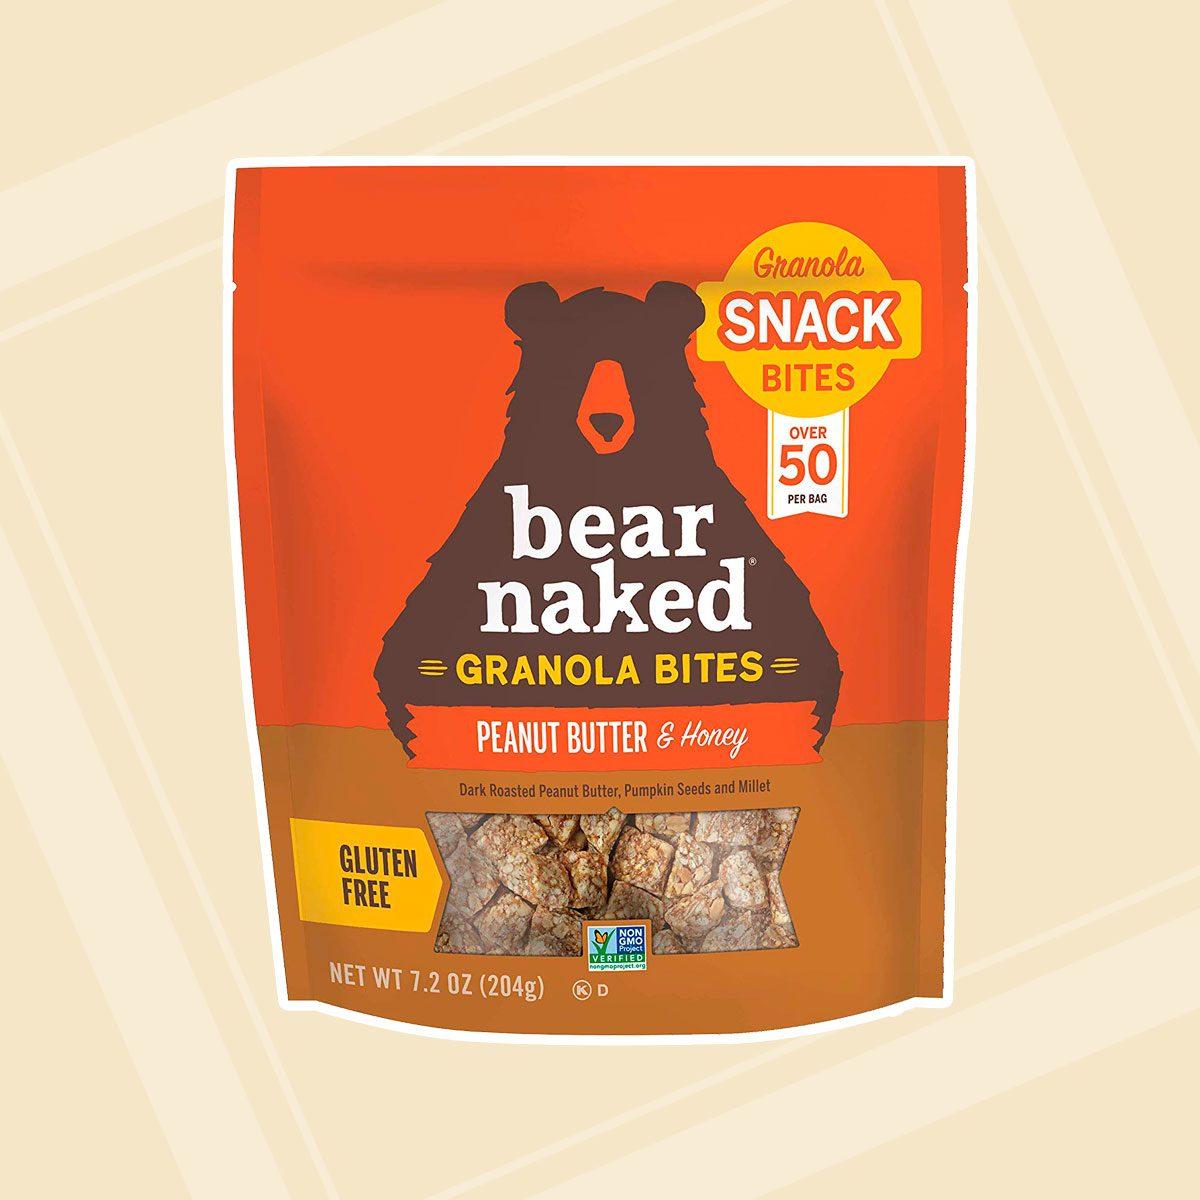 Bear Naked Peanut Butter & Honey Granola Bites - Gluten Free, Non-GMO, Kosher, Vegetarian Friendly - 7.2 Oz